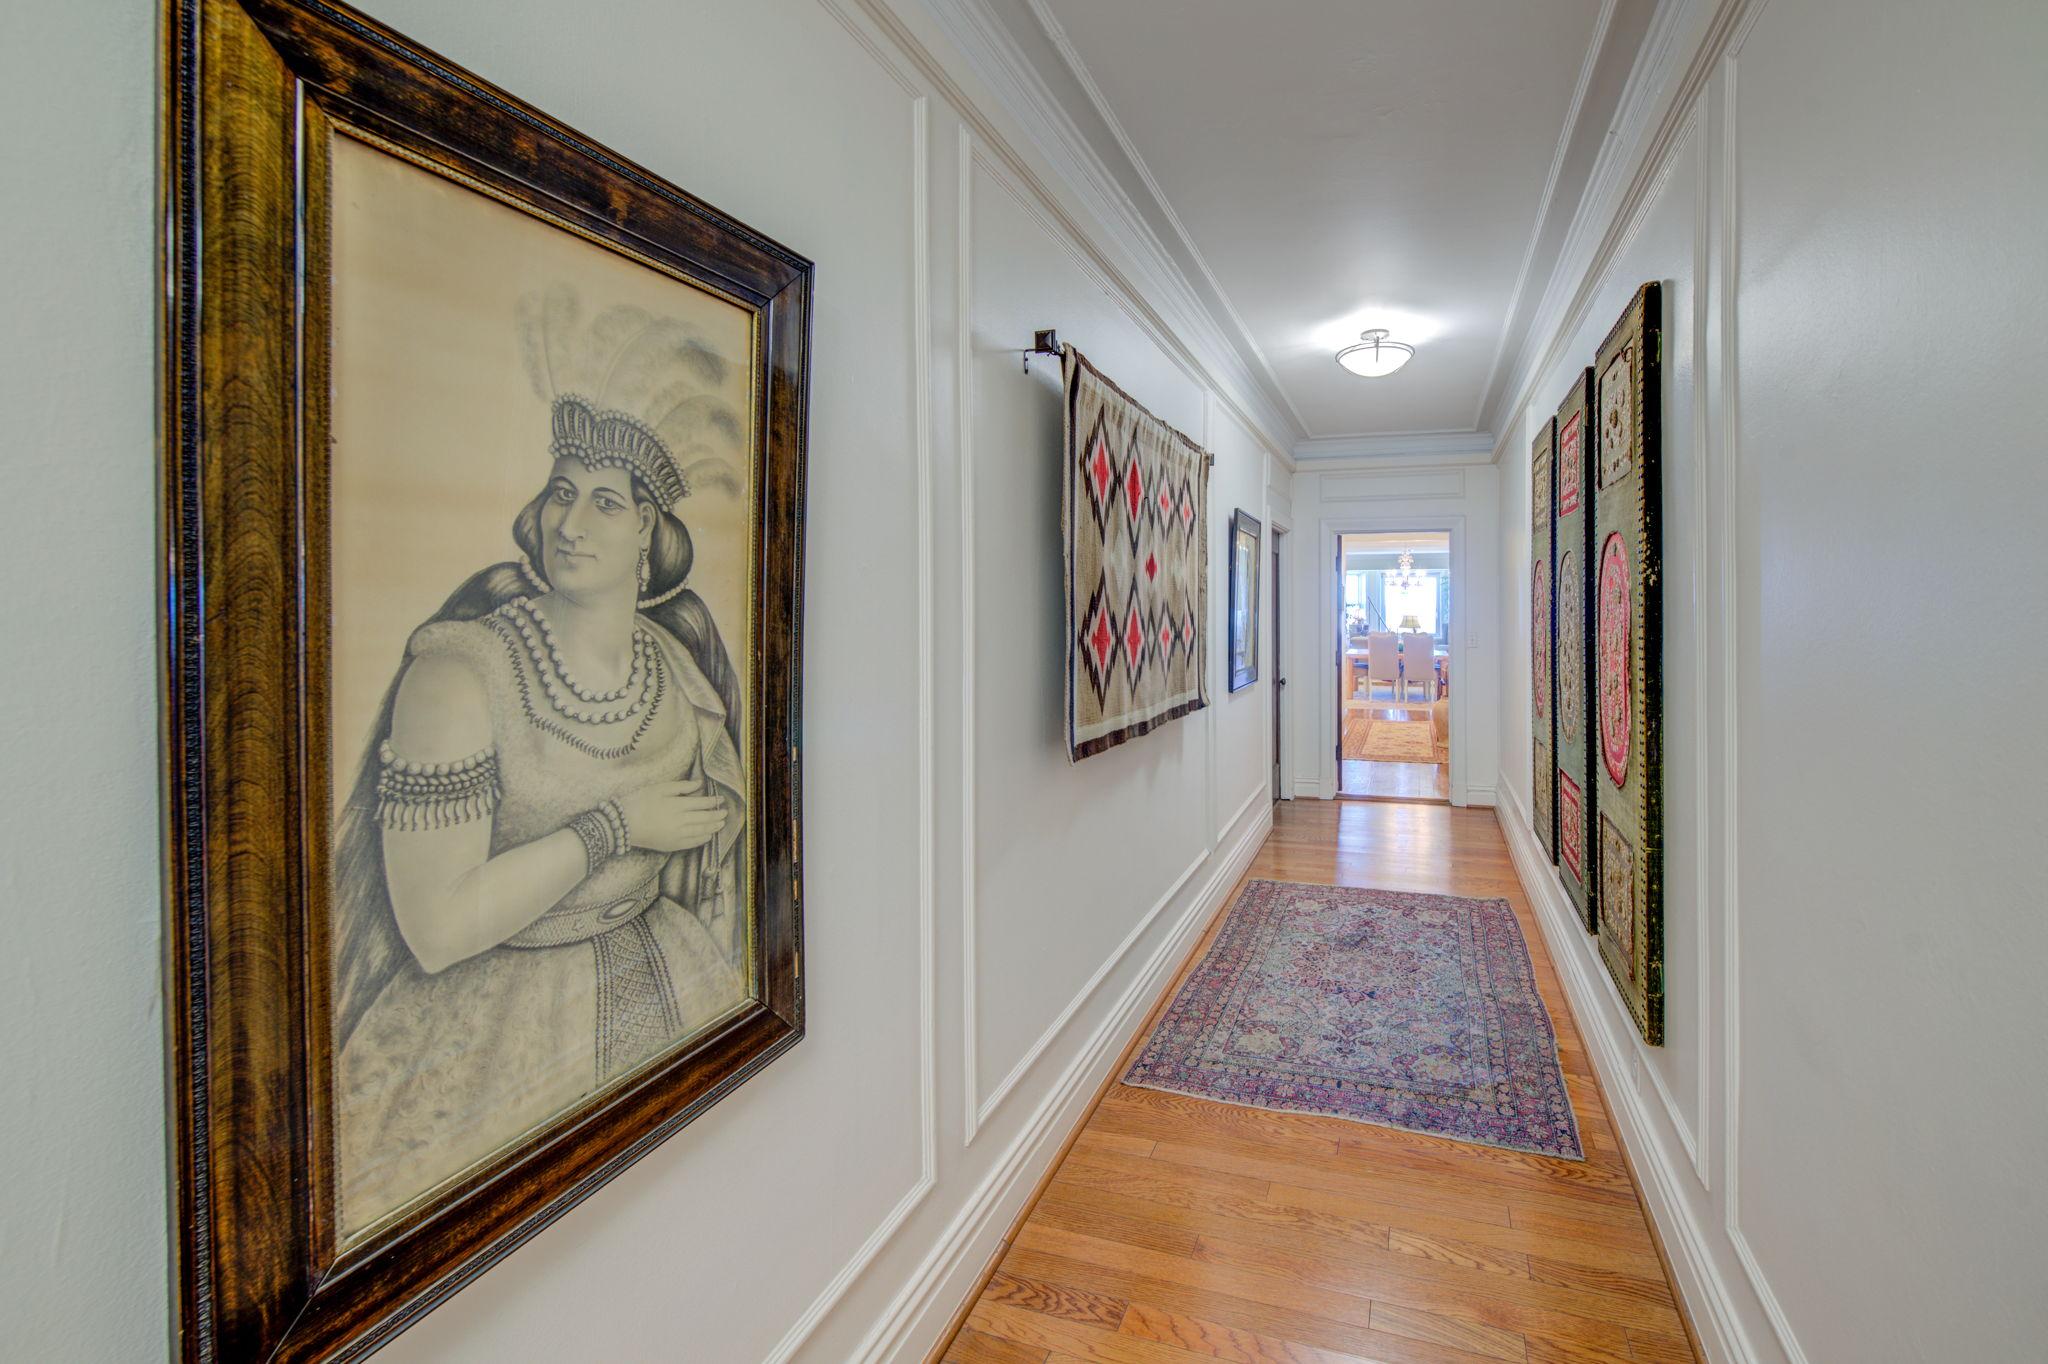 Hallway to Unit